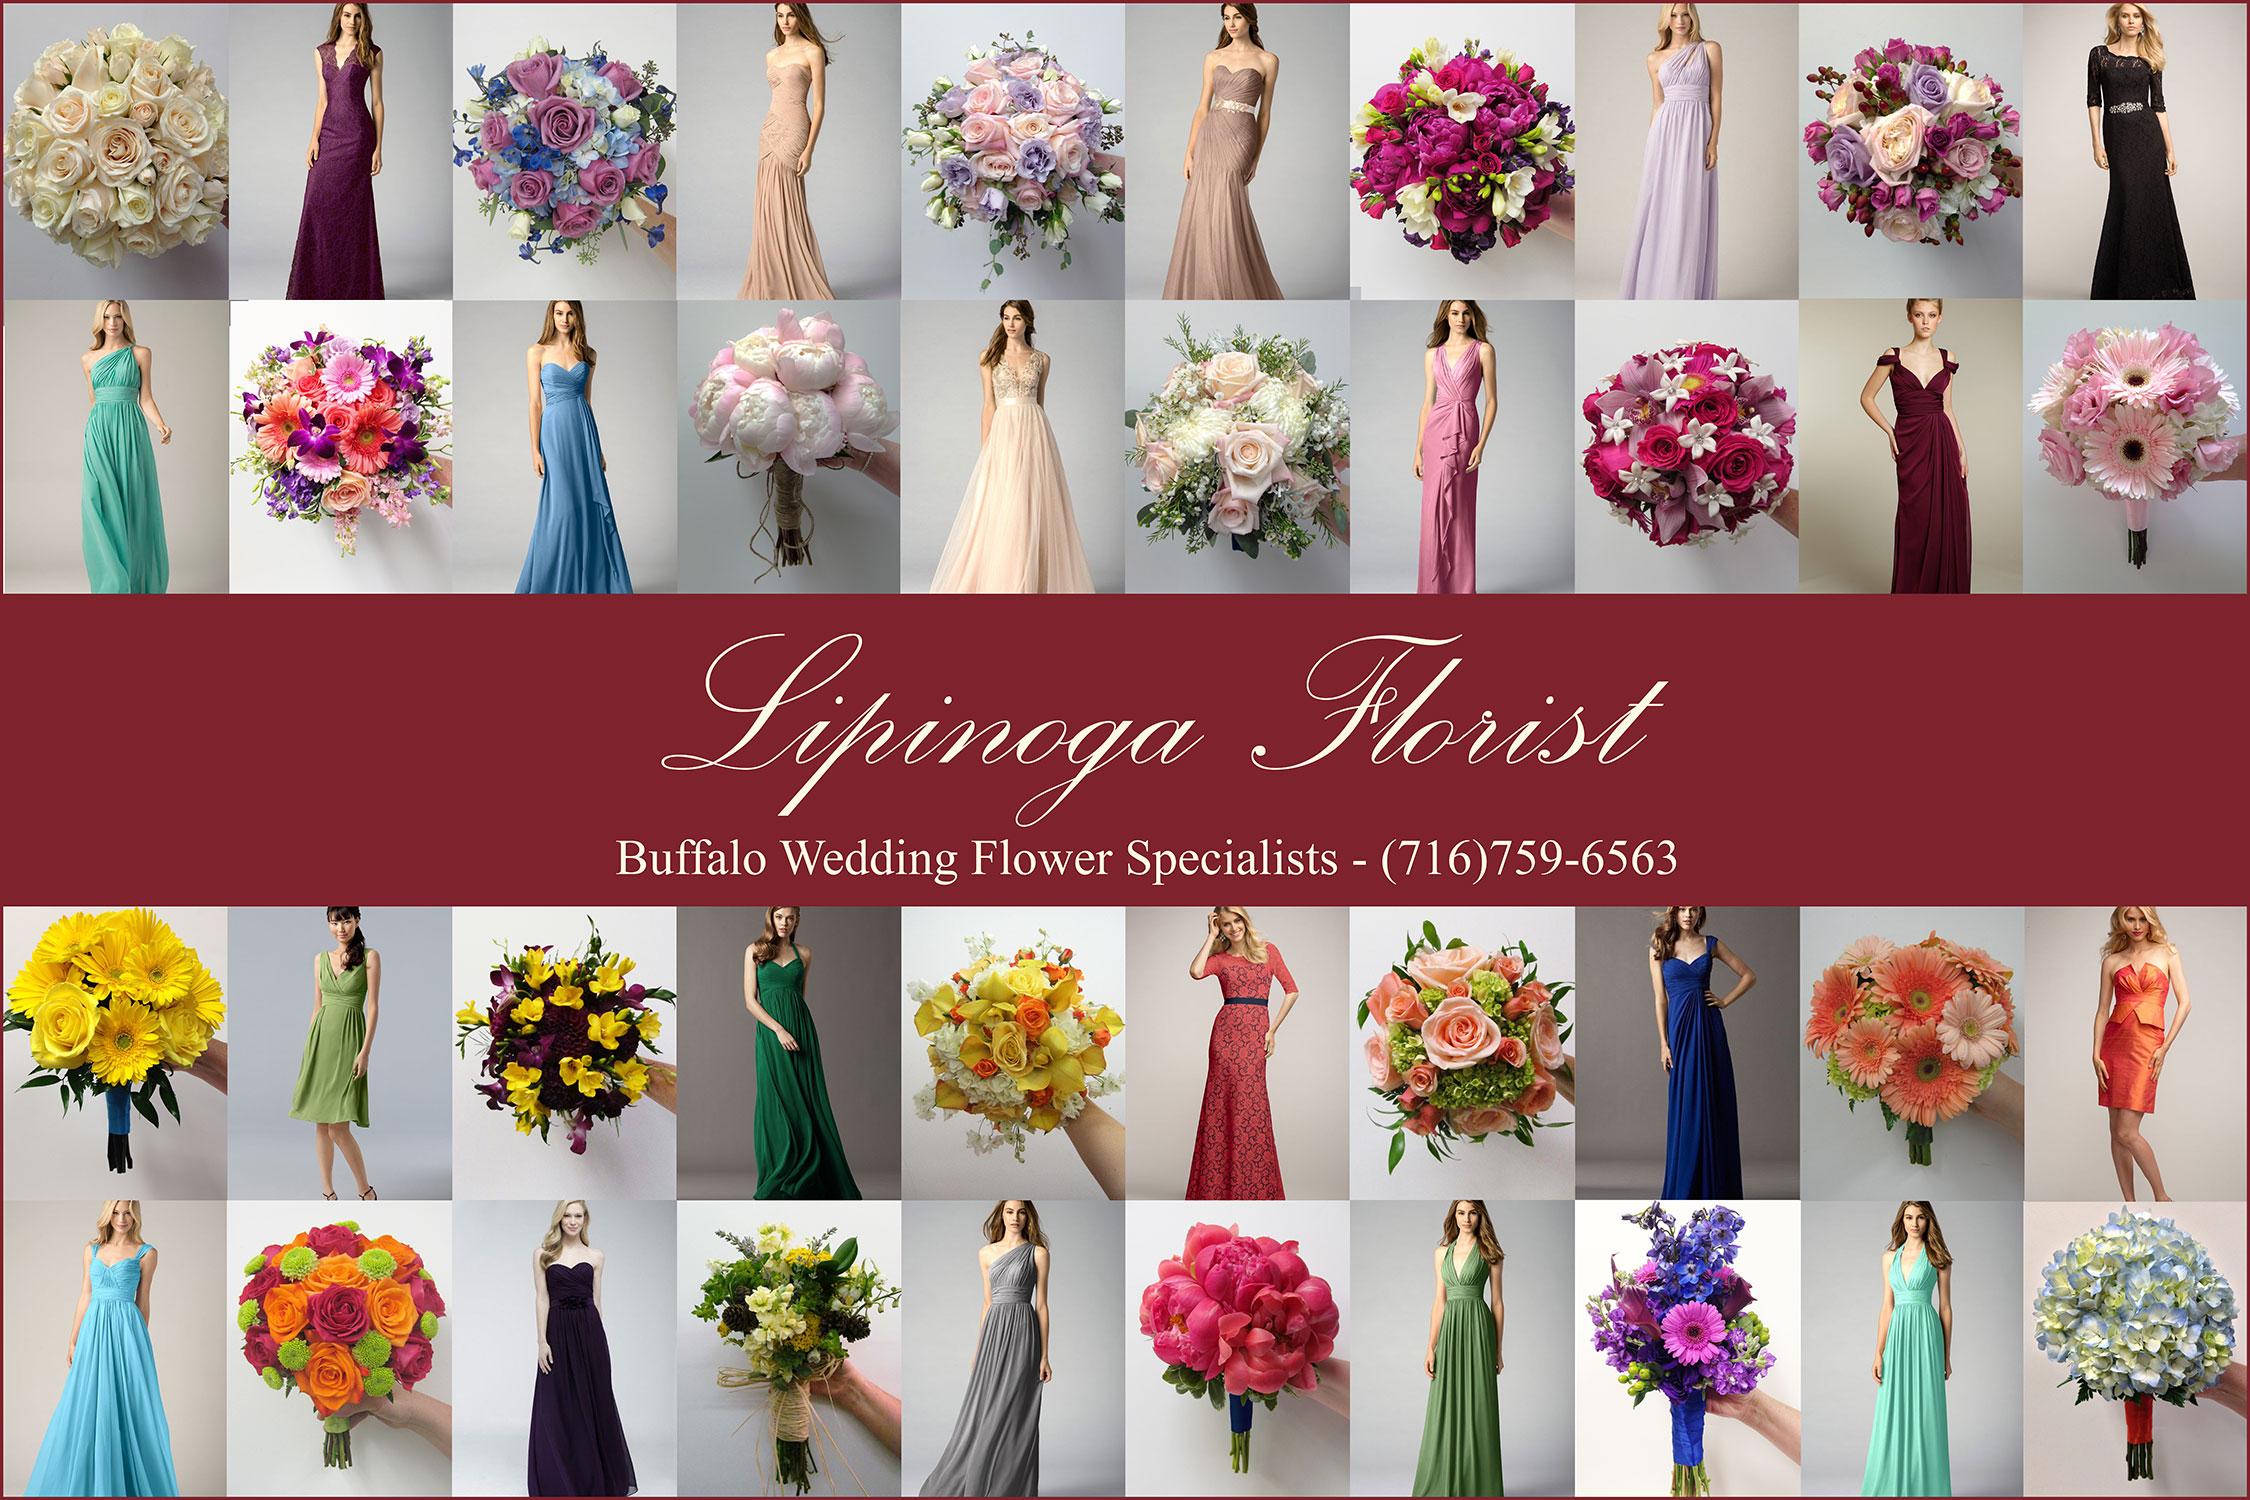 April | 2015 | Buffalo Wedding & Event Flowers by Lipinoga Florist